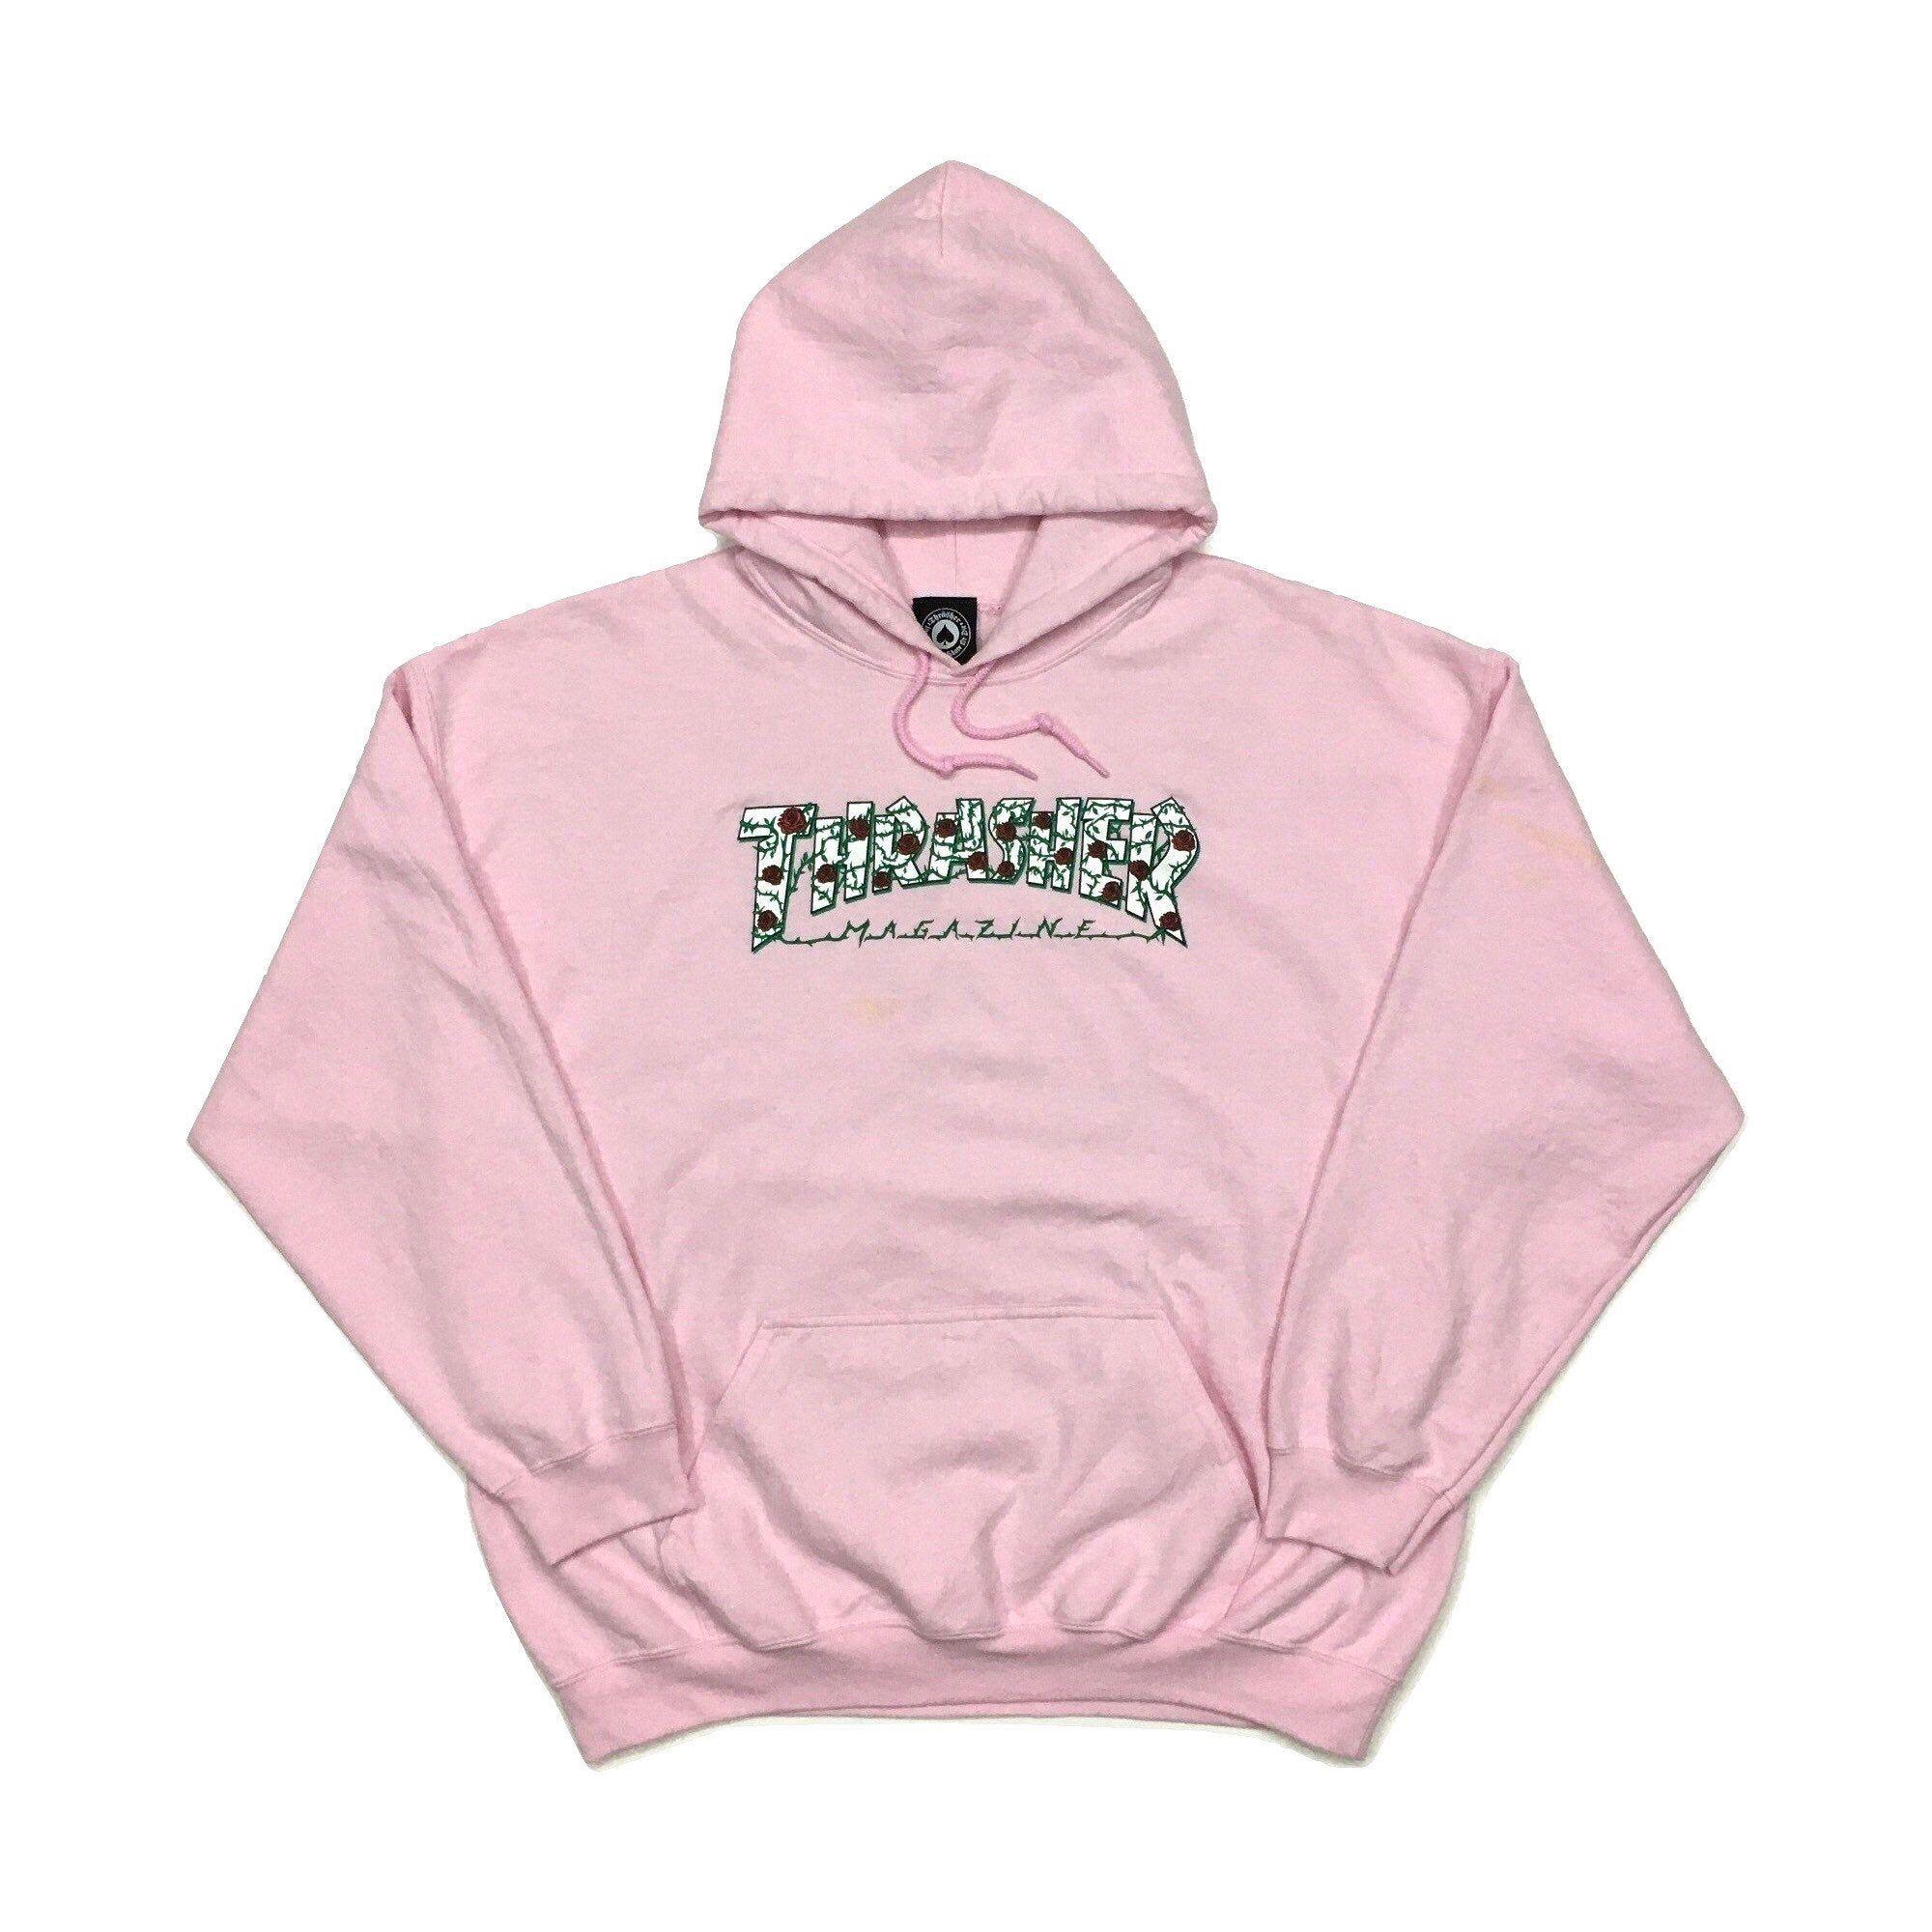 Vintage Thrasher Rose Hoodie Thrasher Roses Pink Hoodie Etsy Rose Hoodie Hoodies Thrasher Sweatshirt [ 2000 x 2000 Pixel ]